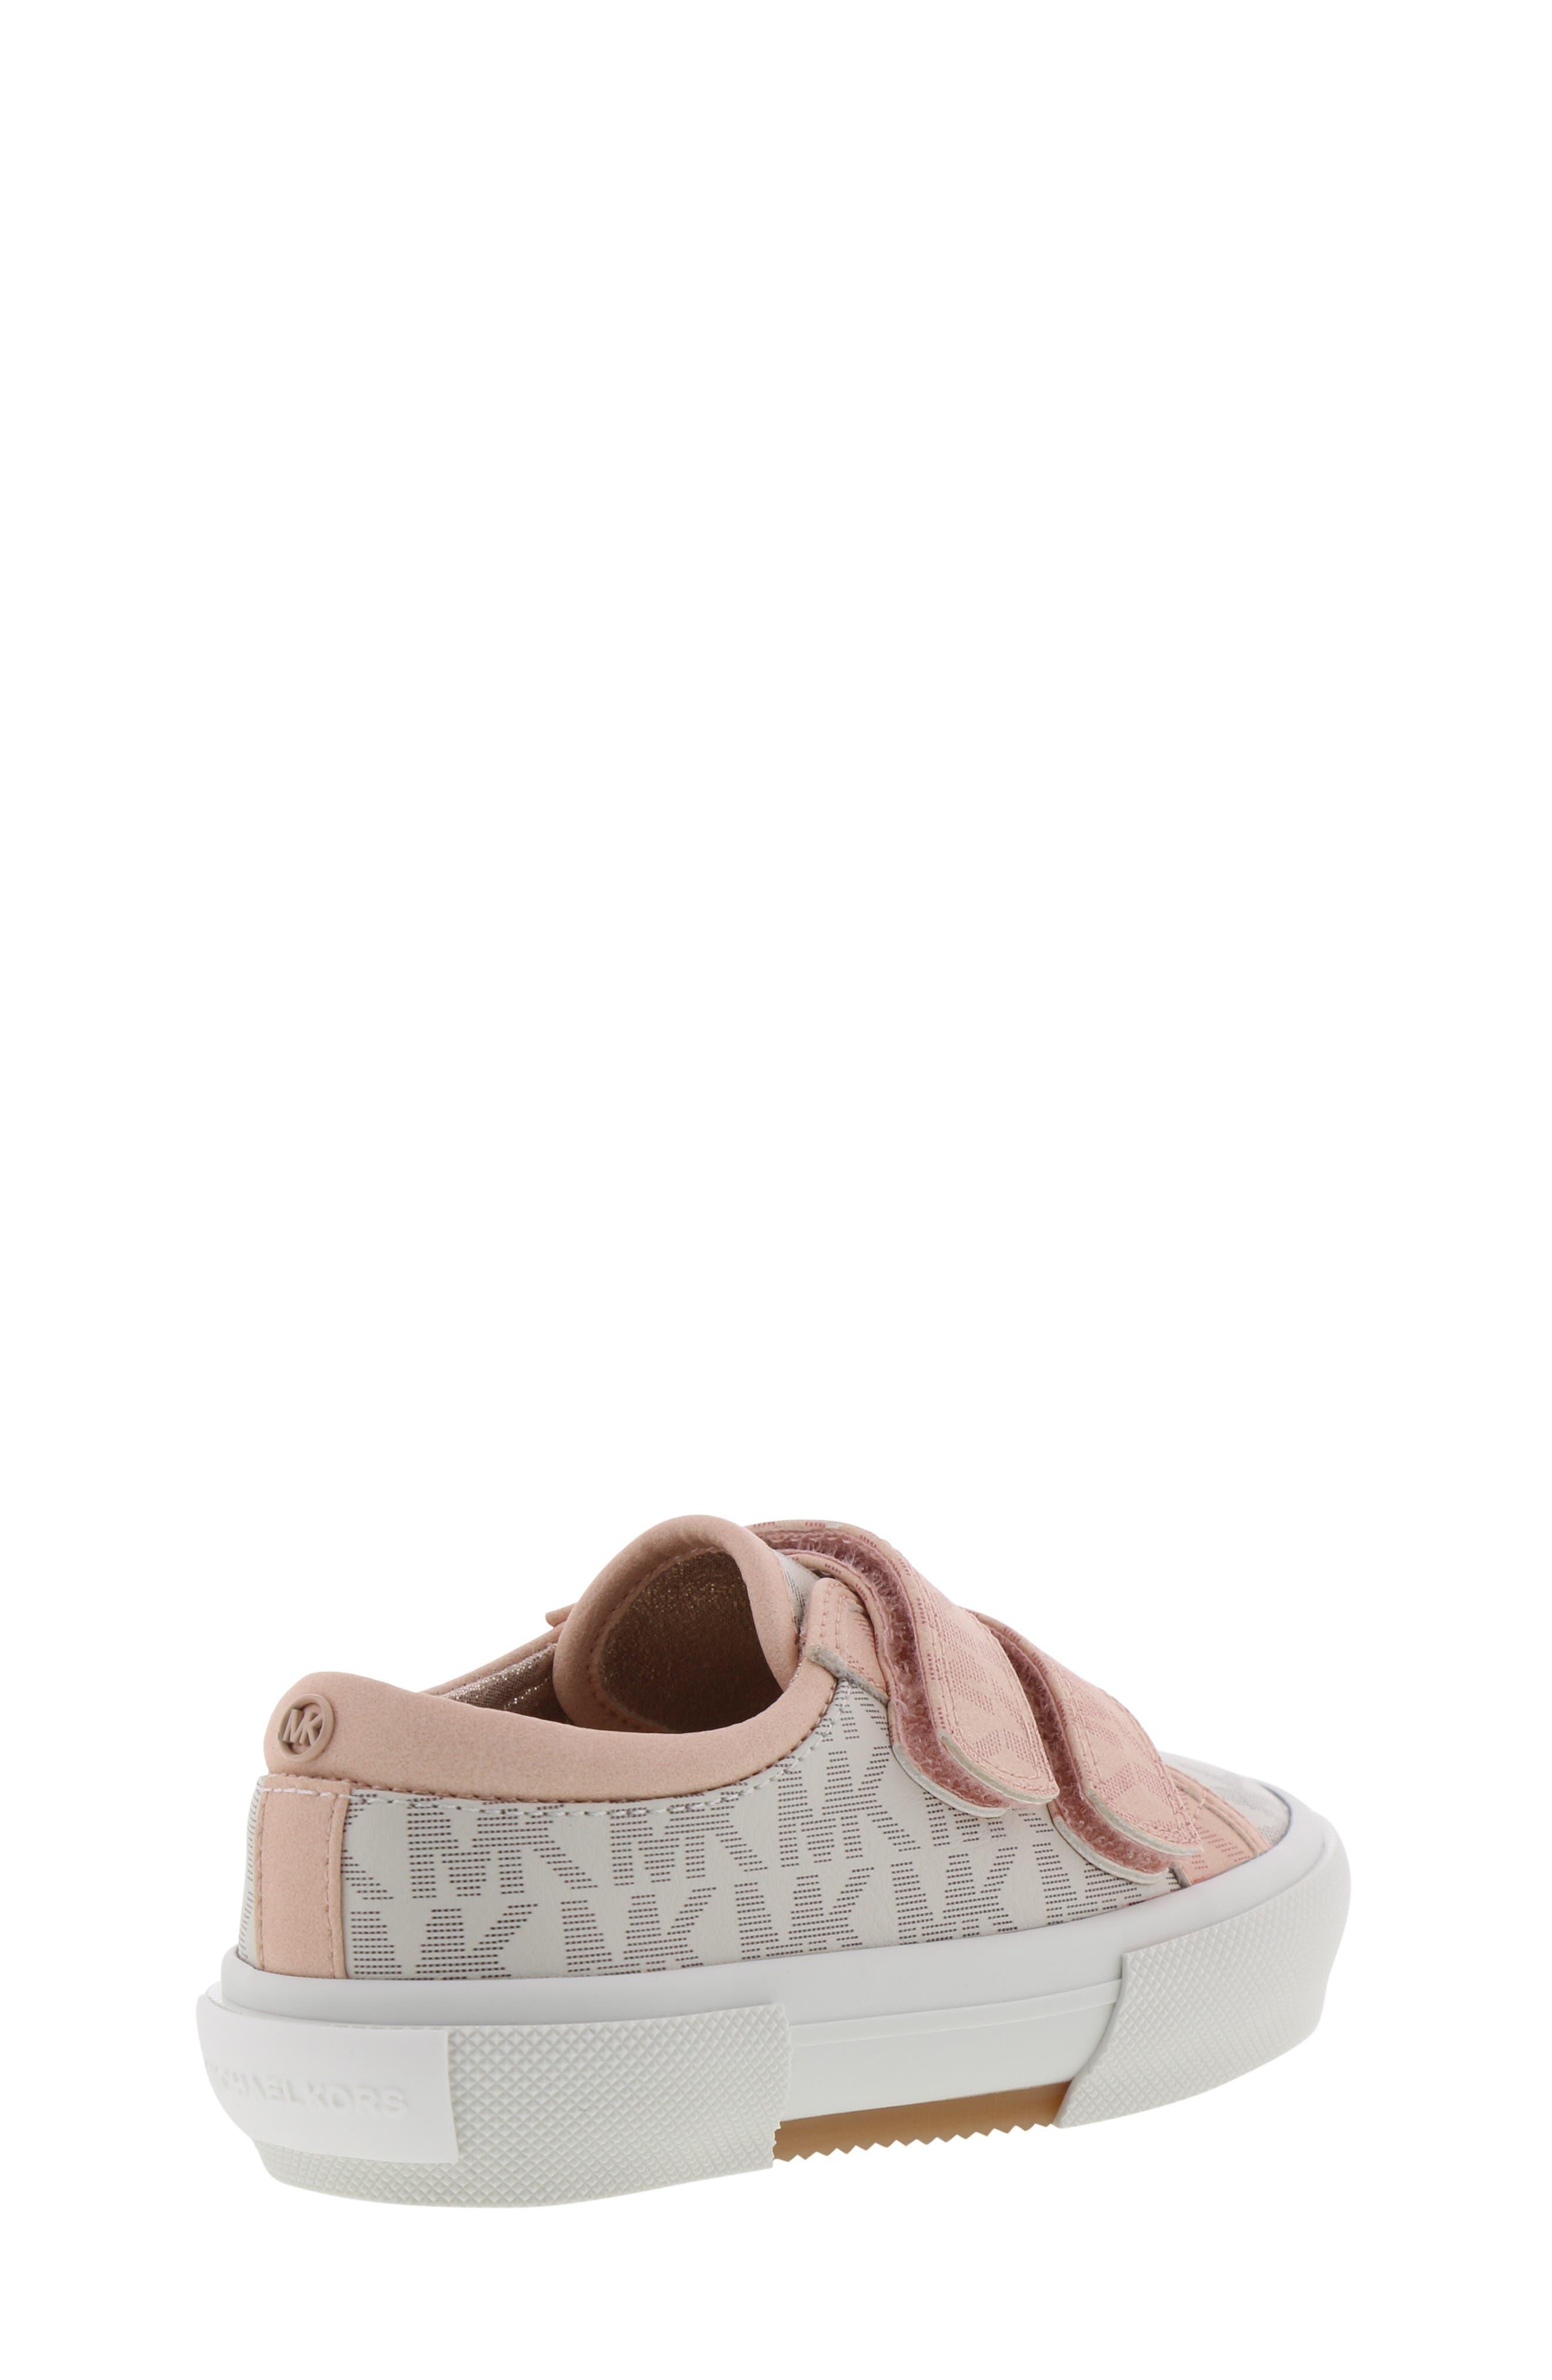 Ima Double Platform Sneaker,                             Alternate thumbnail 2, color,                             VANILLA/ BLUSH